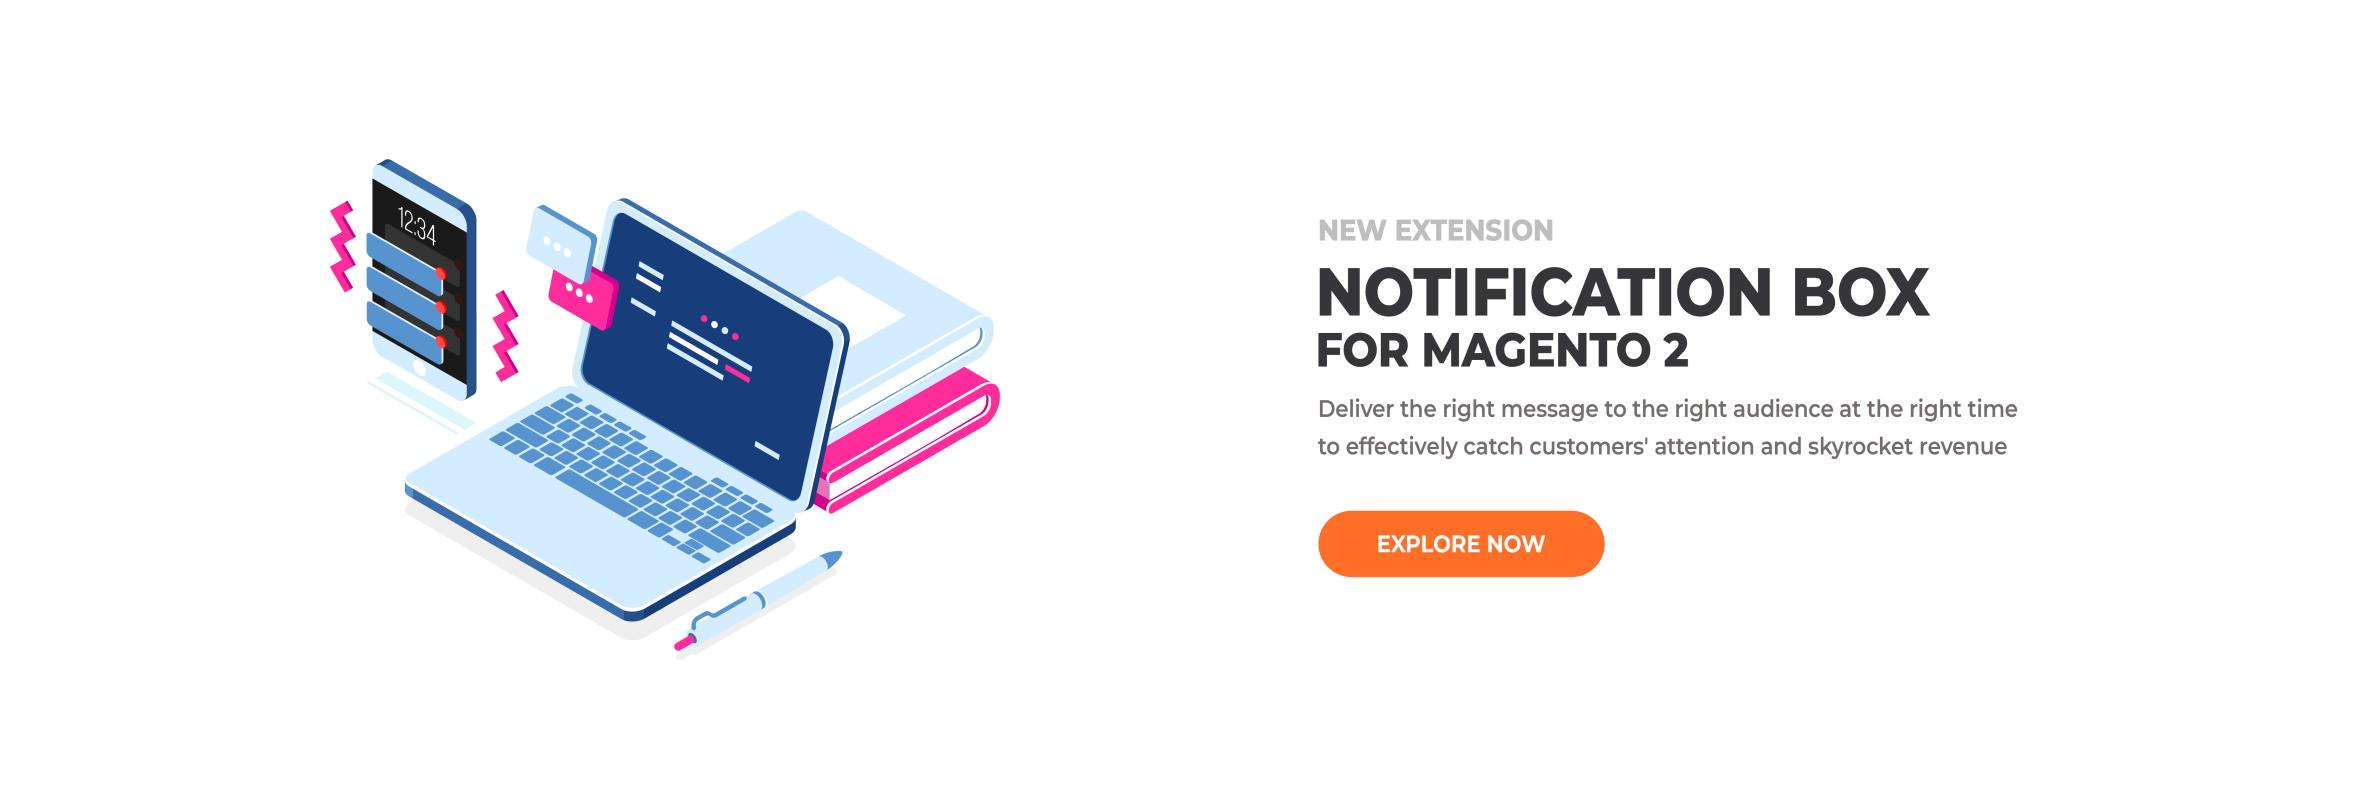 Magento 2 Notification Box